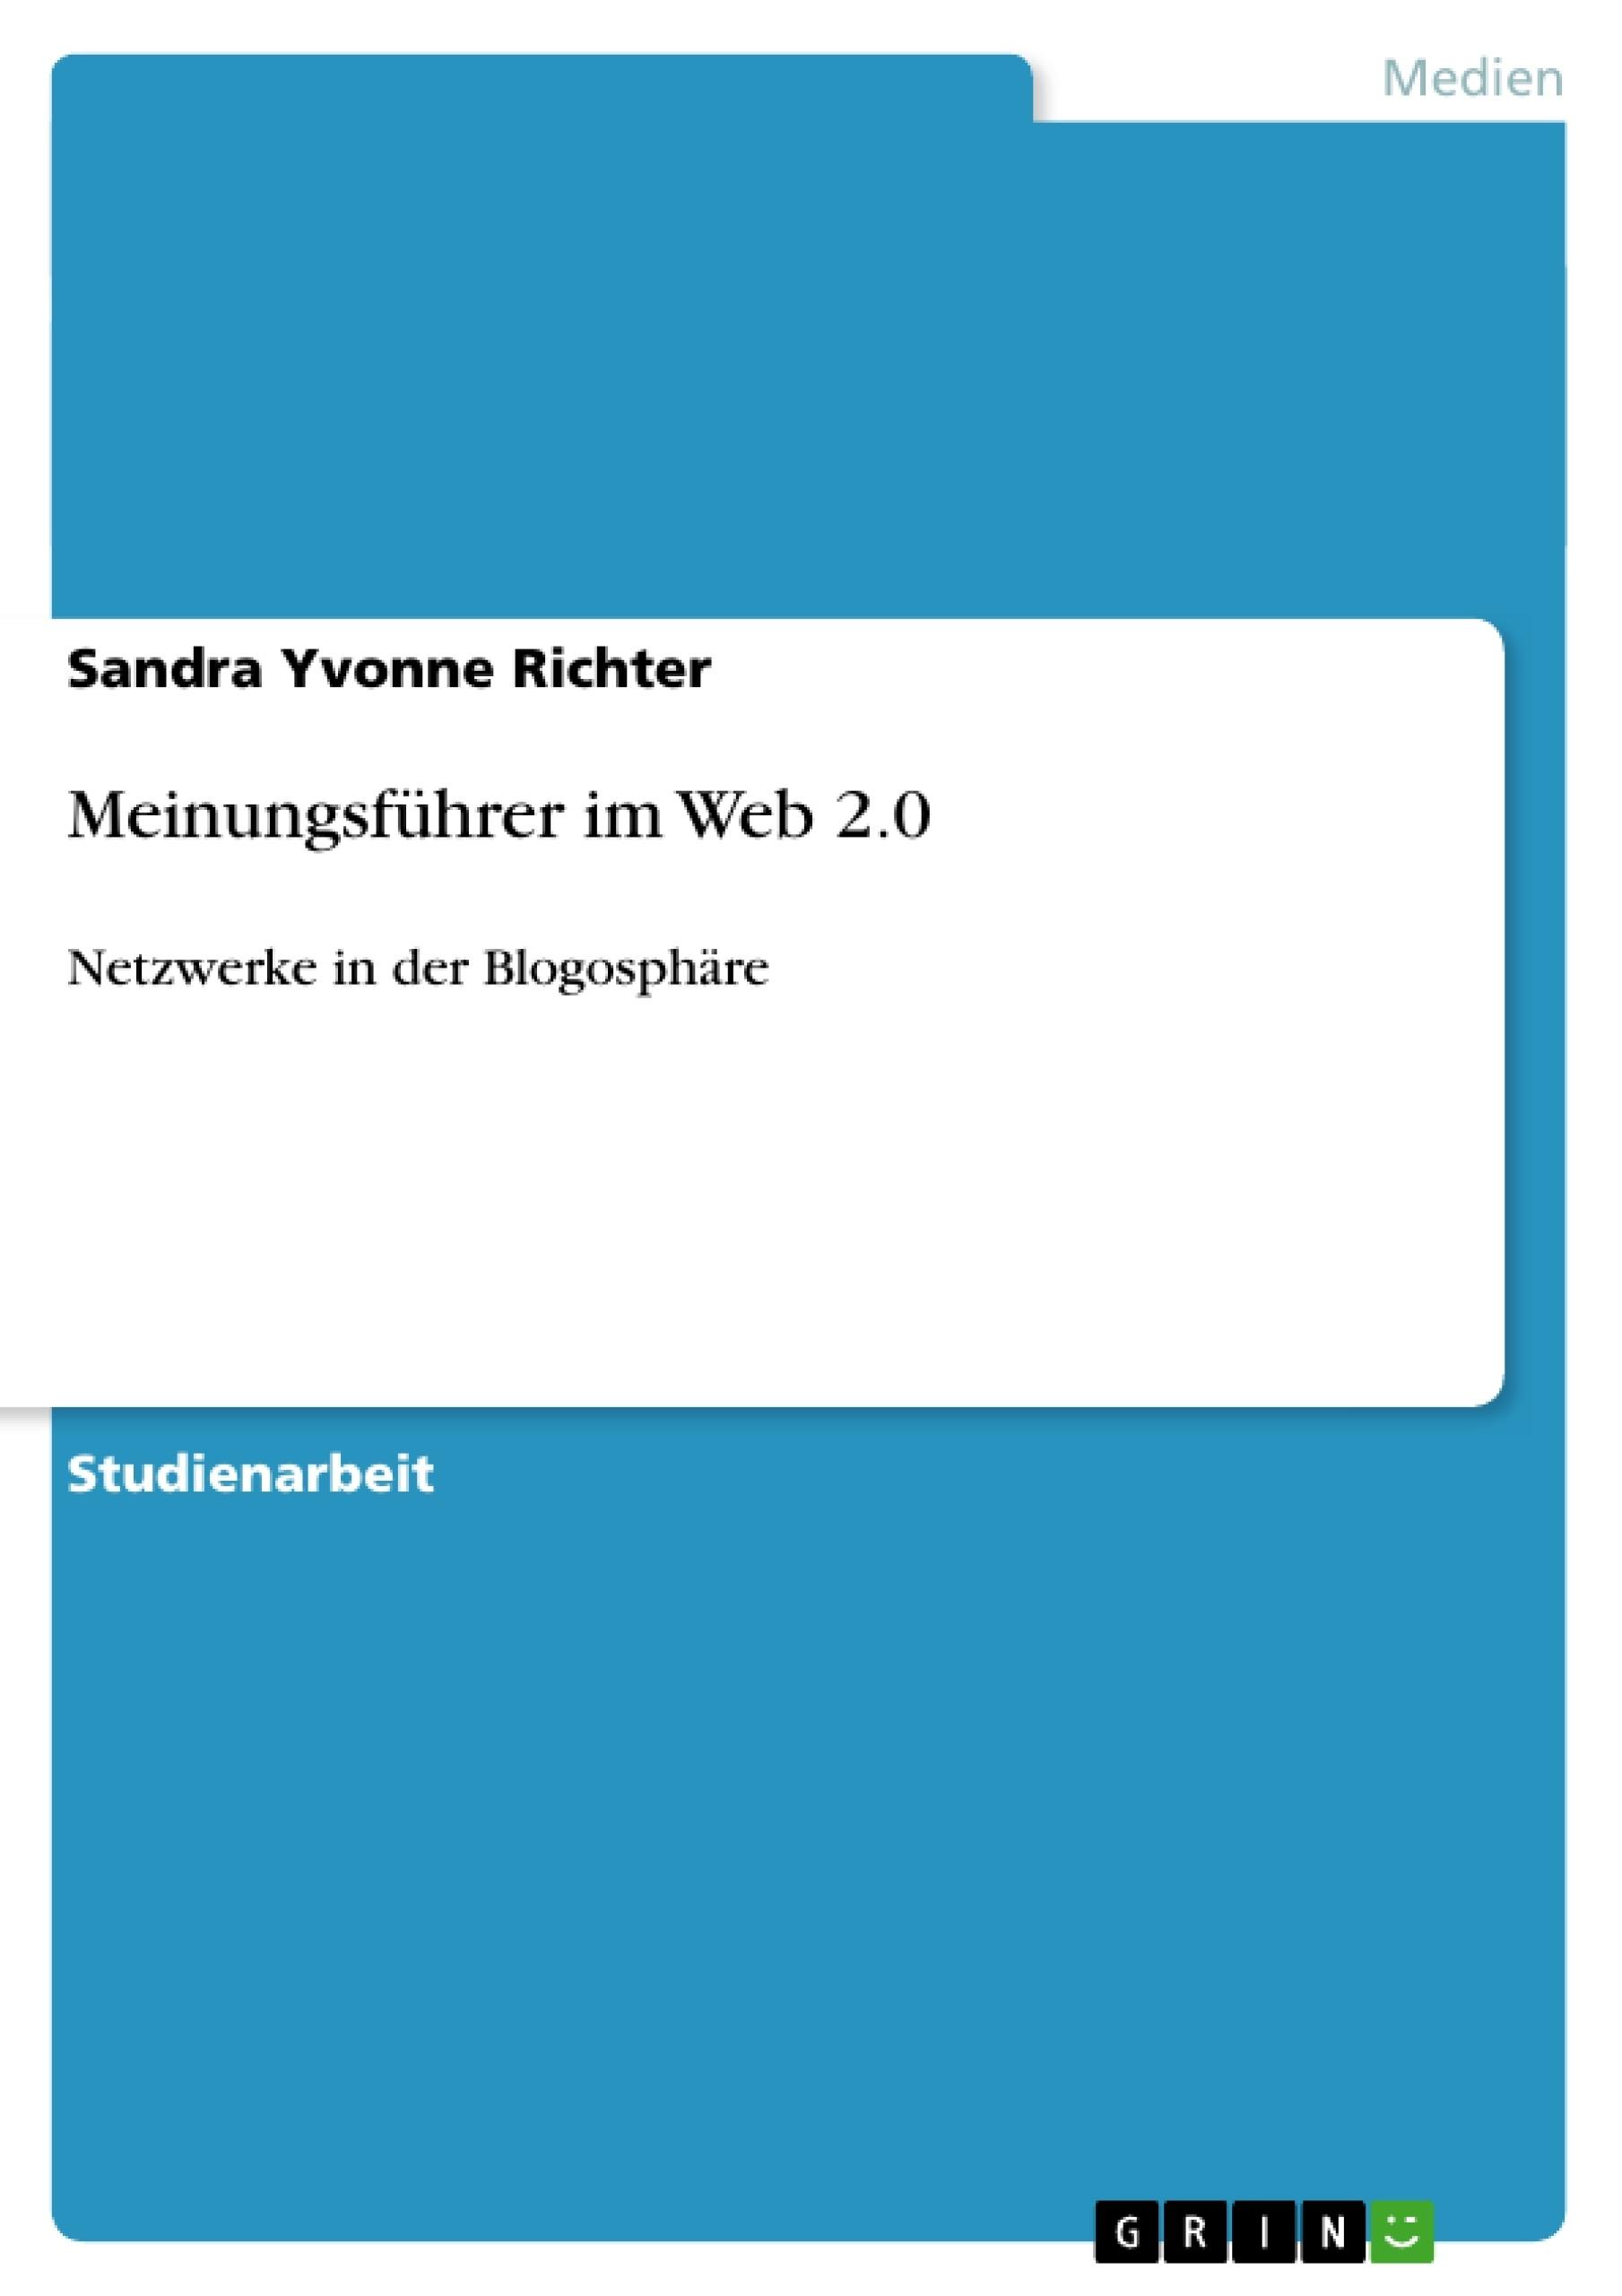 Titel: Meinungsführer im Web 2.0